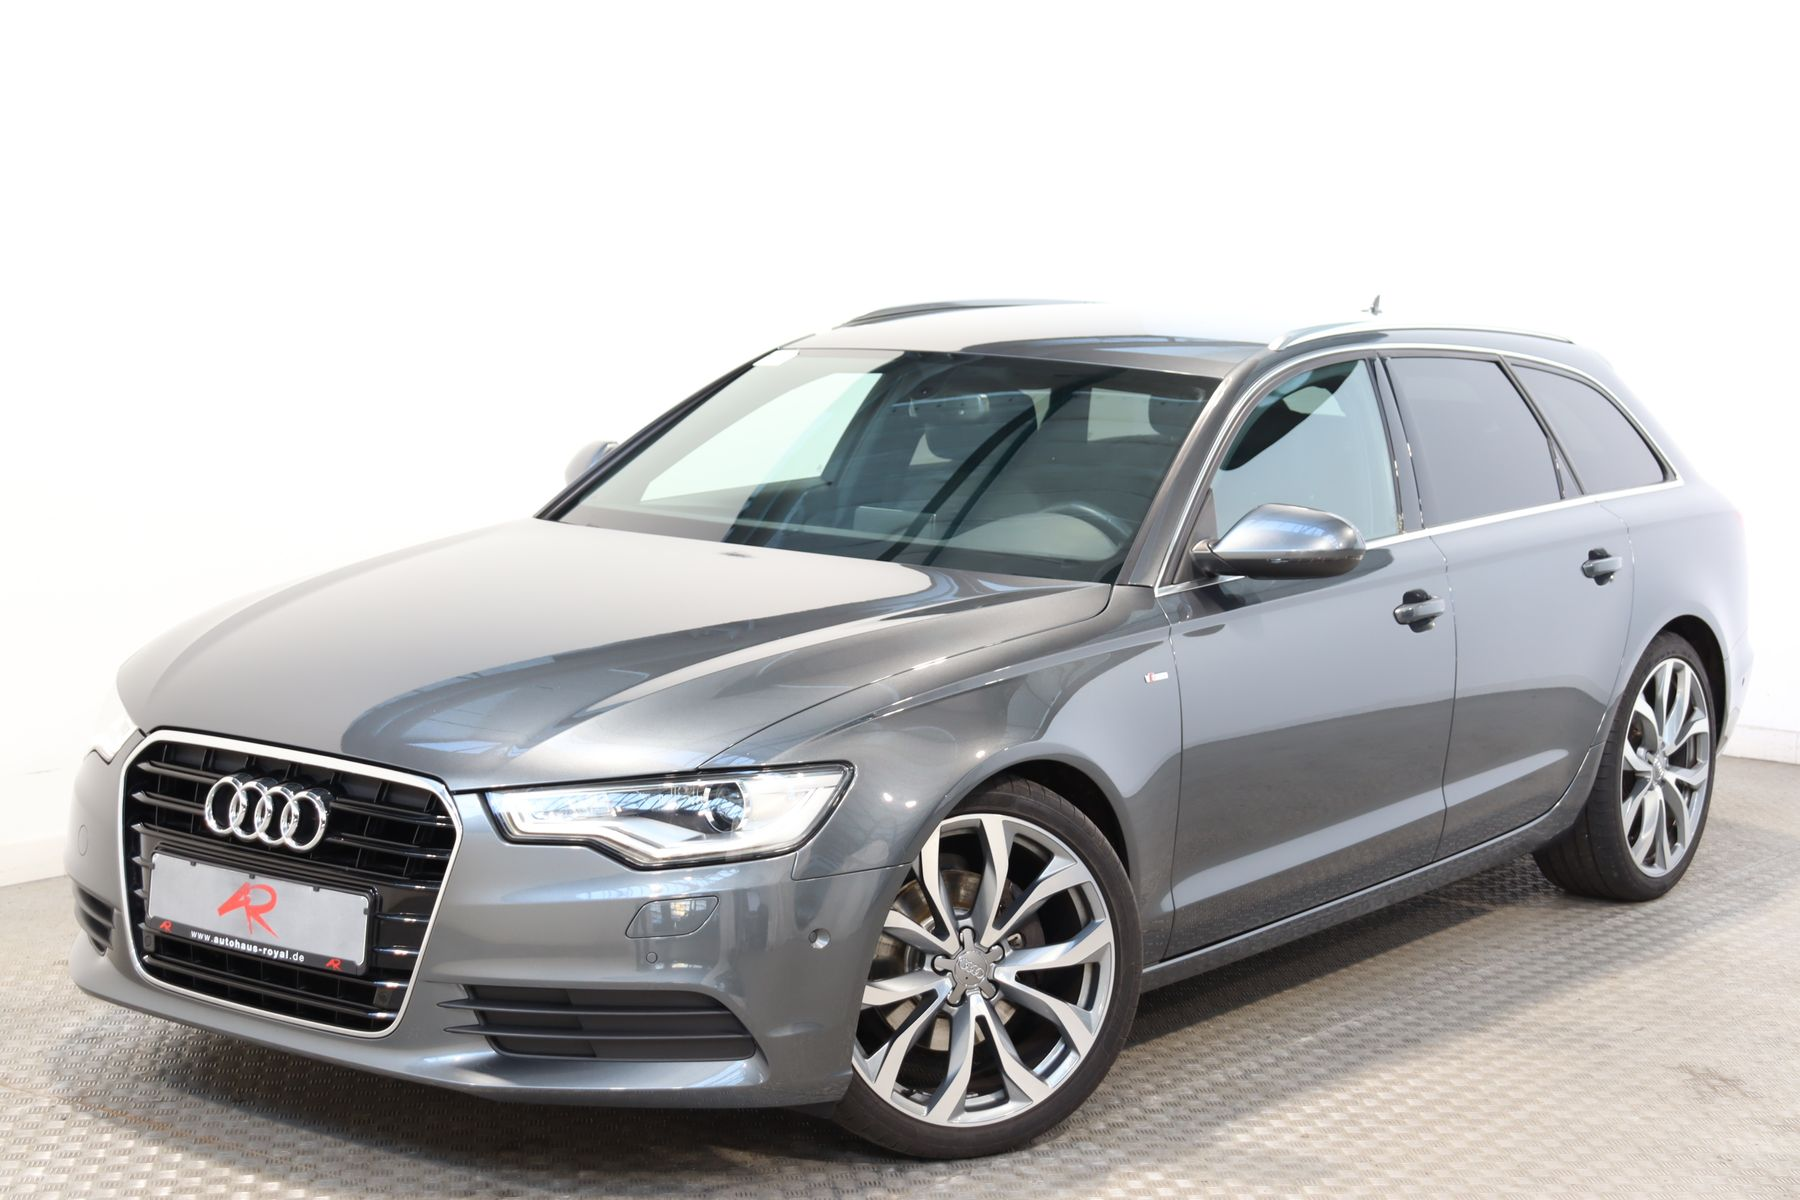 Audi A6 Avant 2.0 TDI S LINE PARKASSIST,STANDHEIZ,20Z, Jahr 2014, Diesel